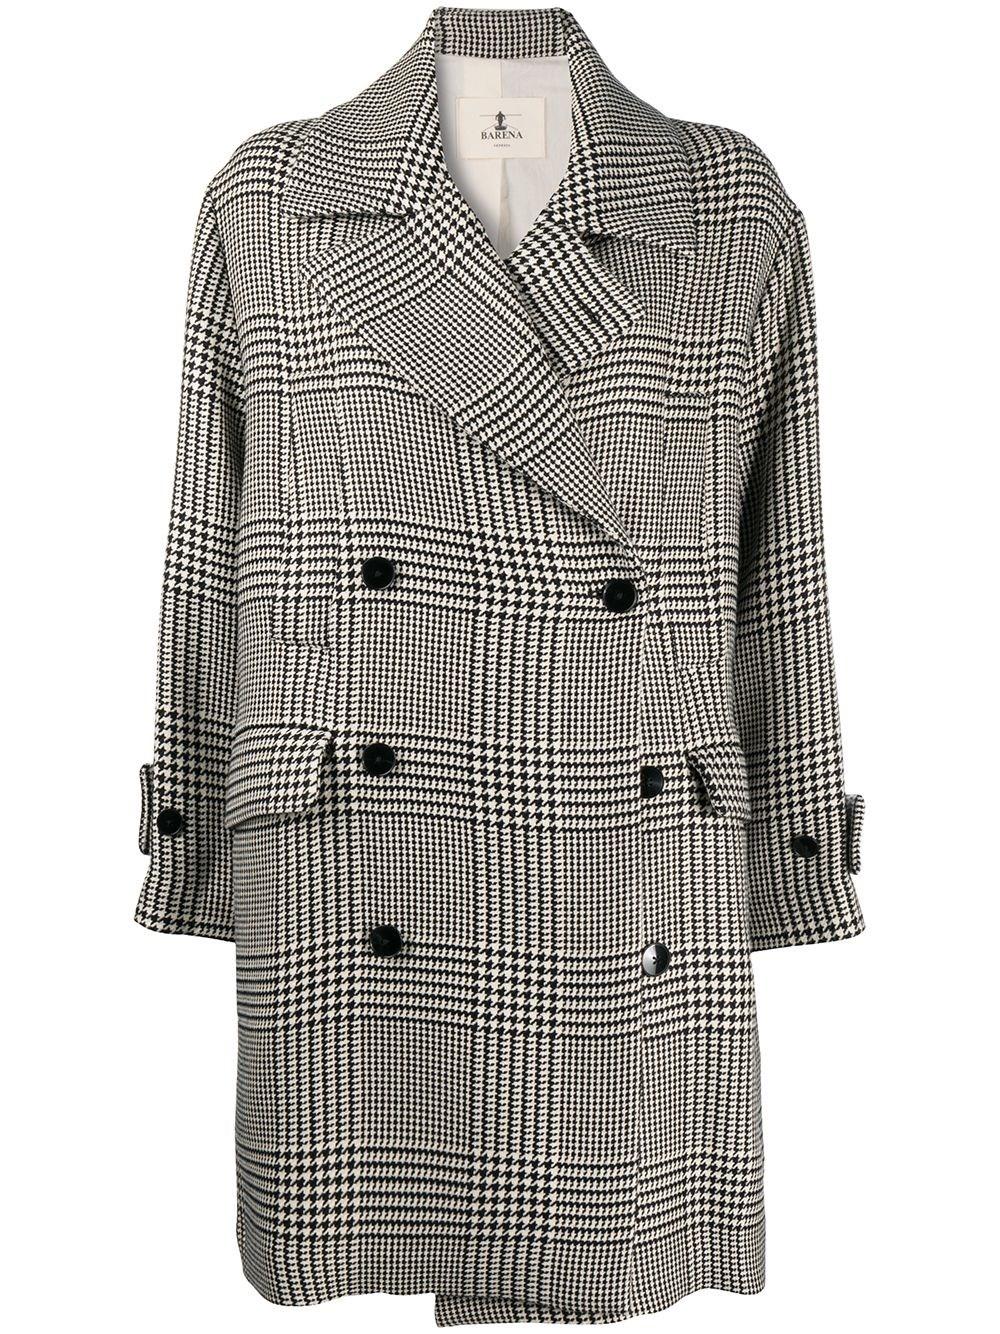 BARENA VENEZIA Checked Double Breasted Coat